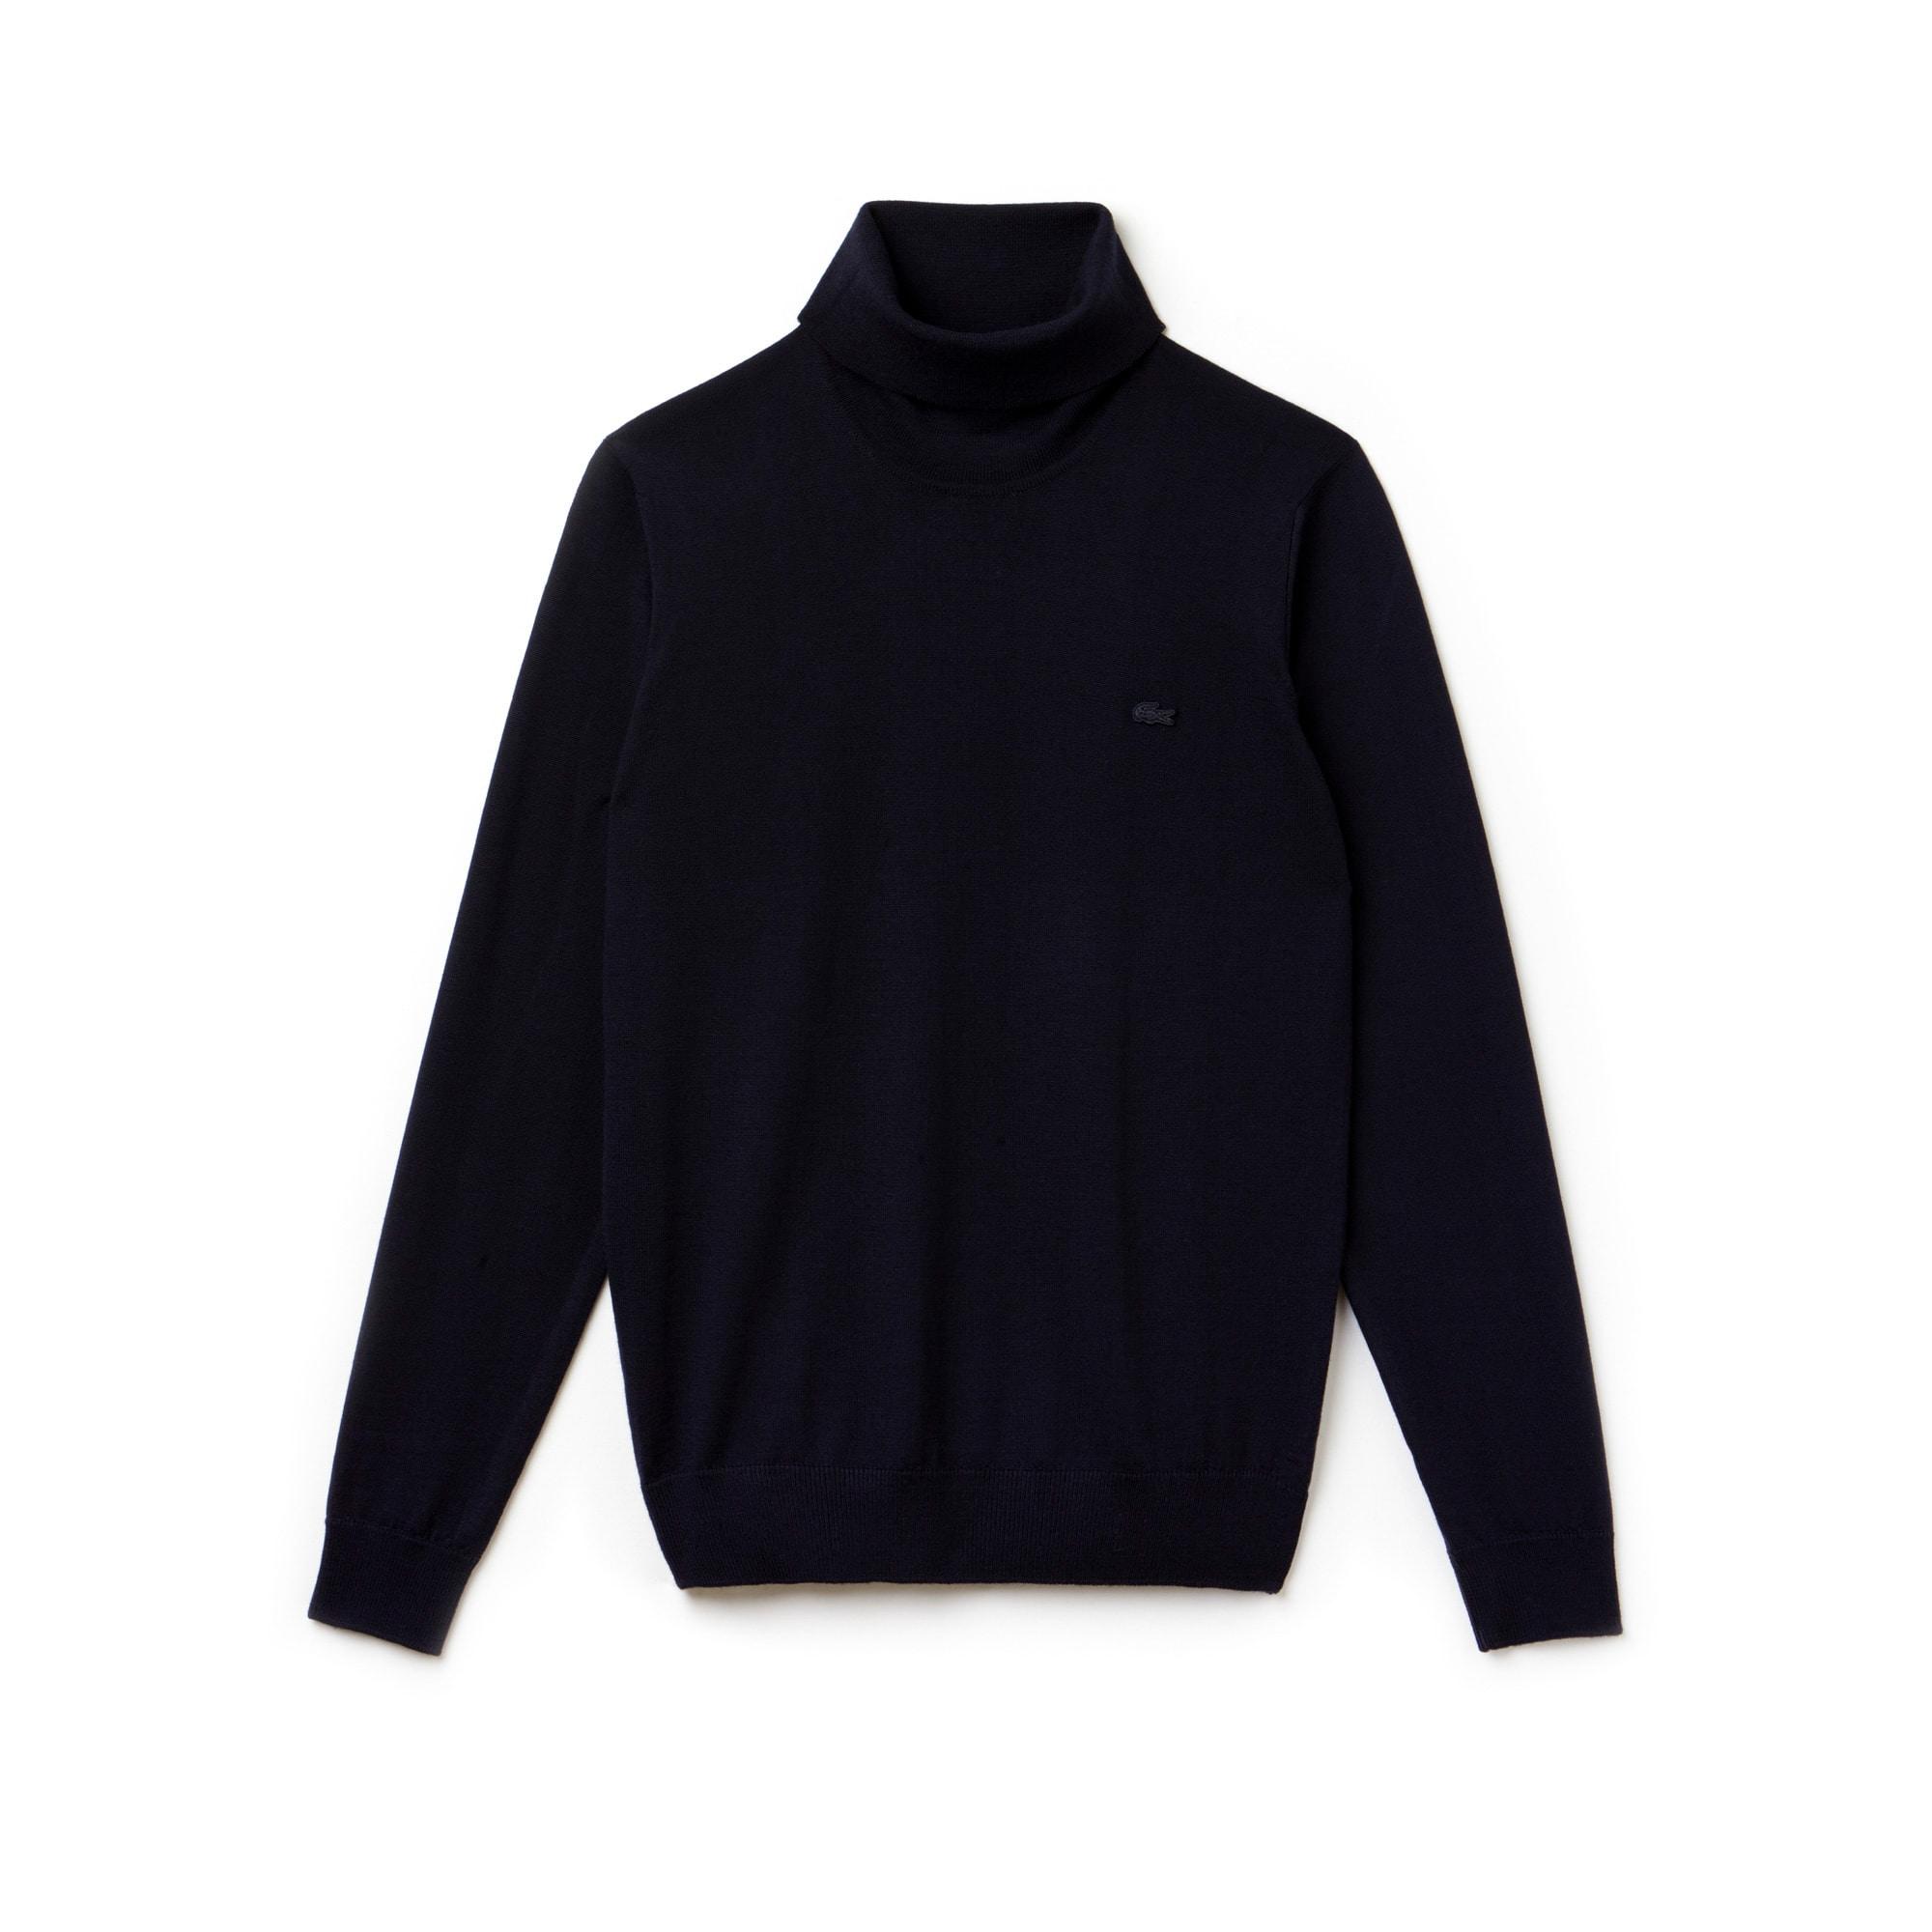 Camisola de gola alta em jersey de lã unicolor